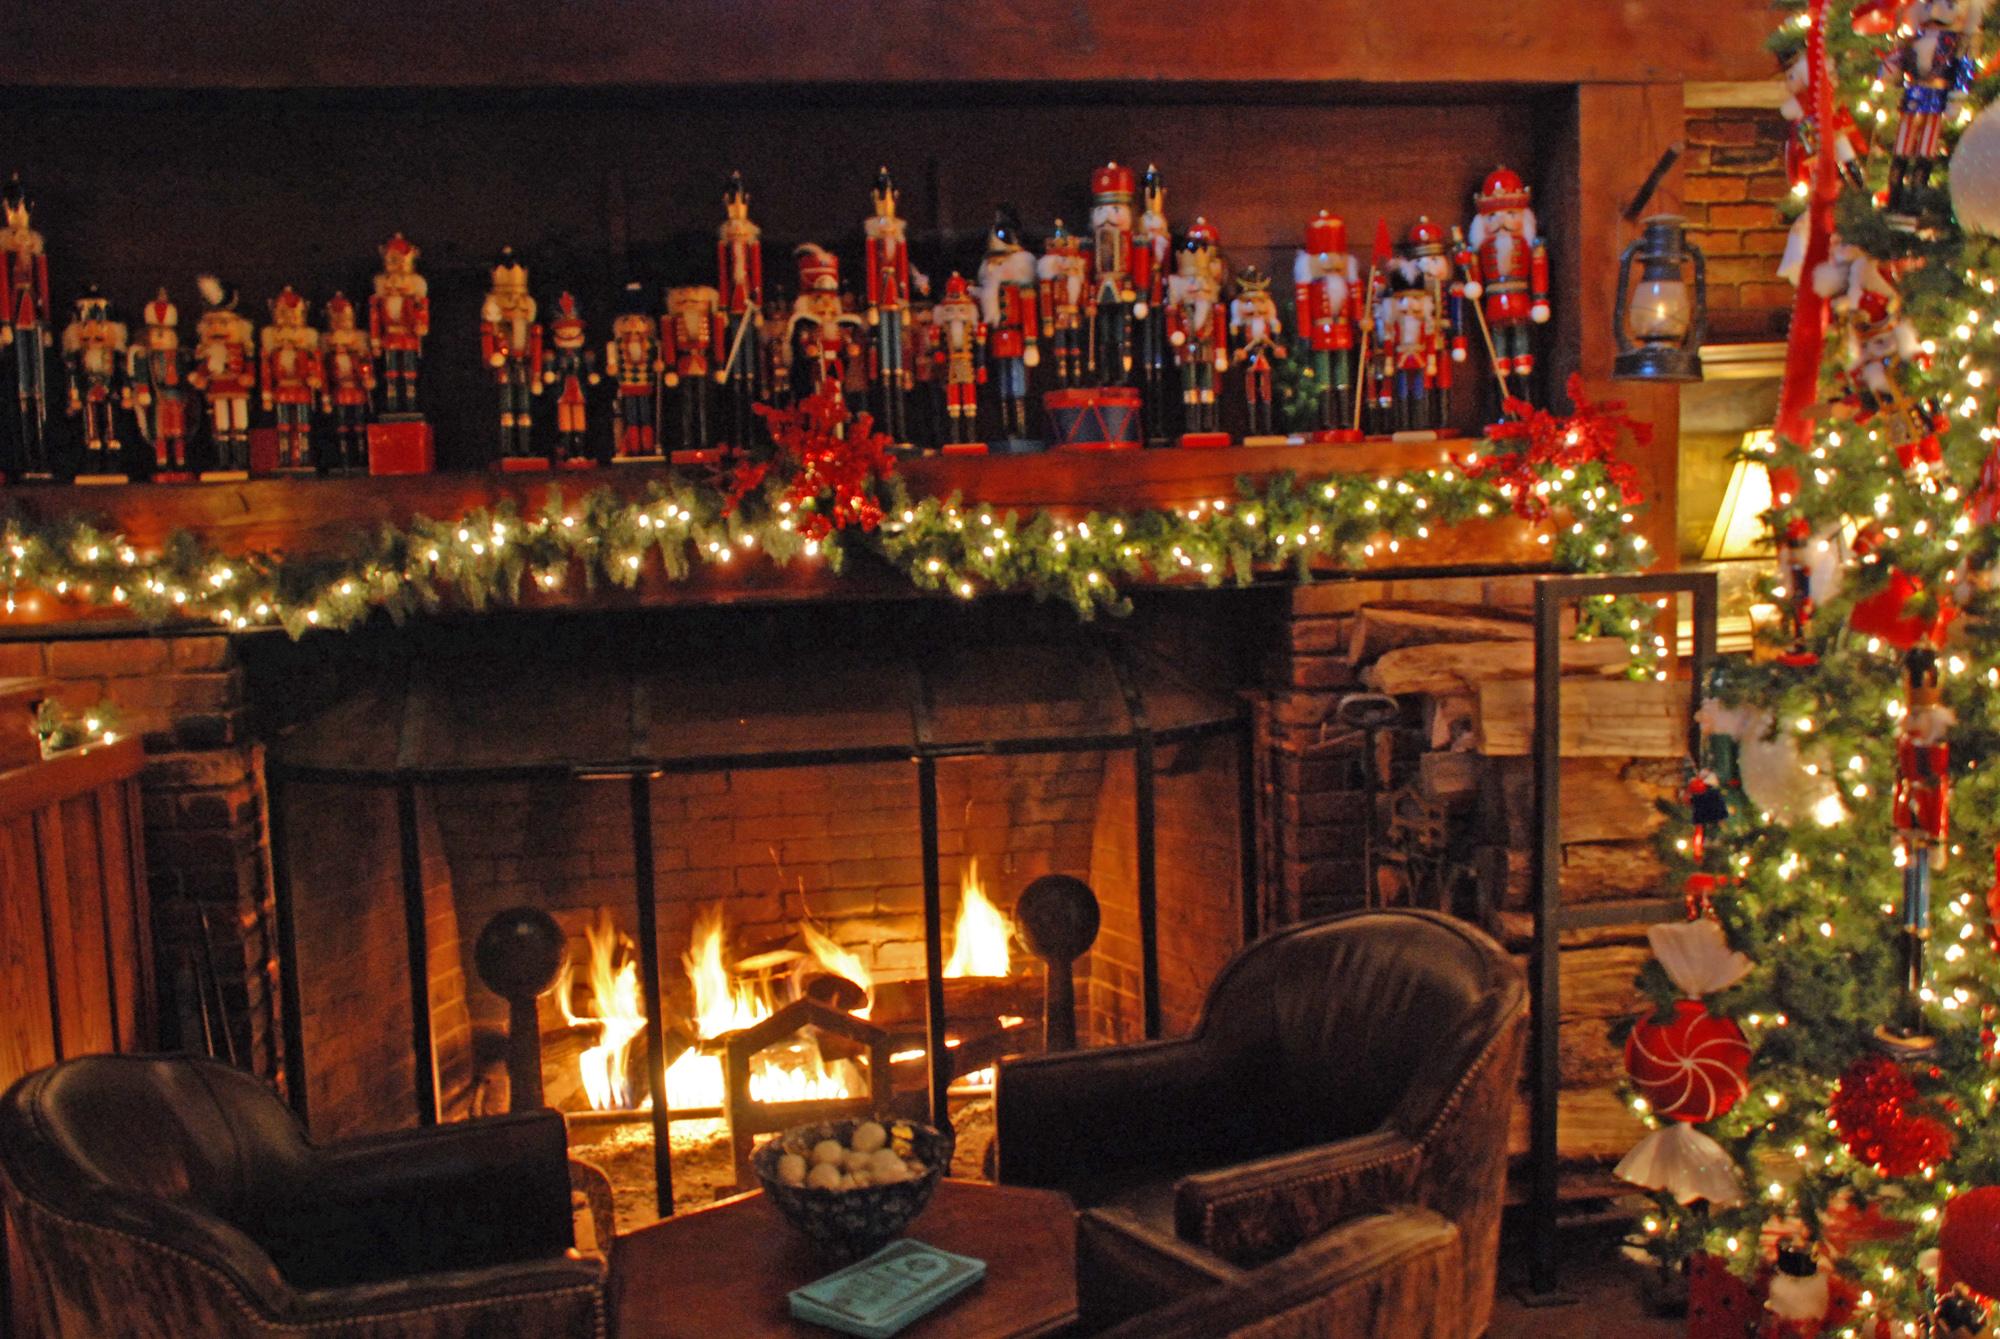 Christmas Fireplace Wallpaper Wallpapers9 2000x1339